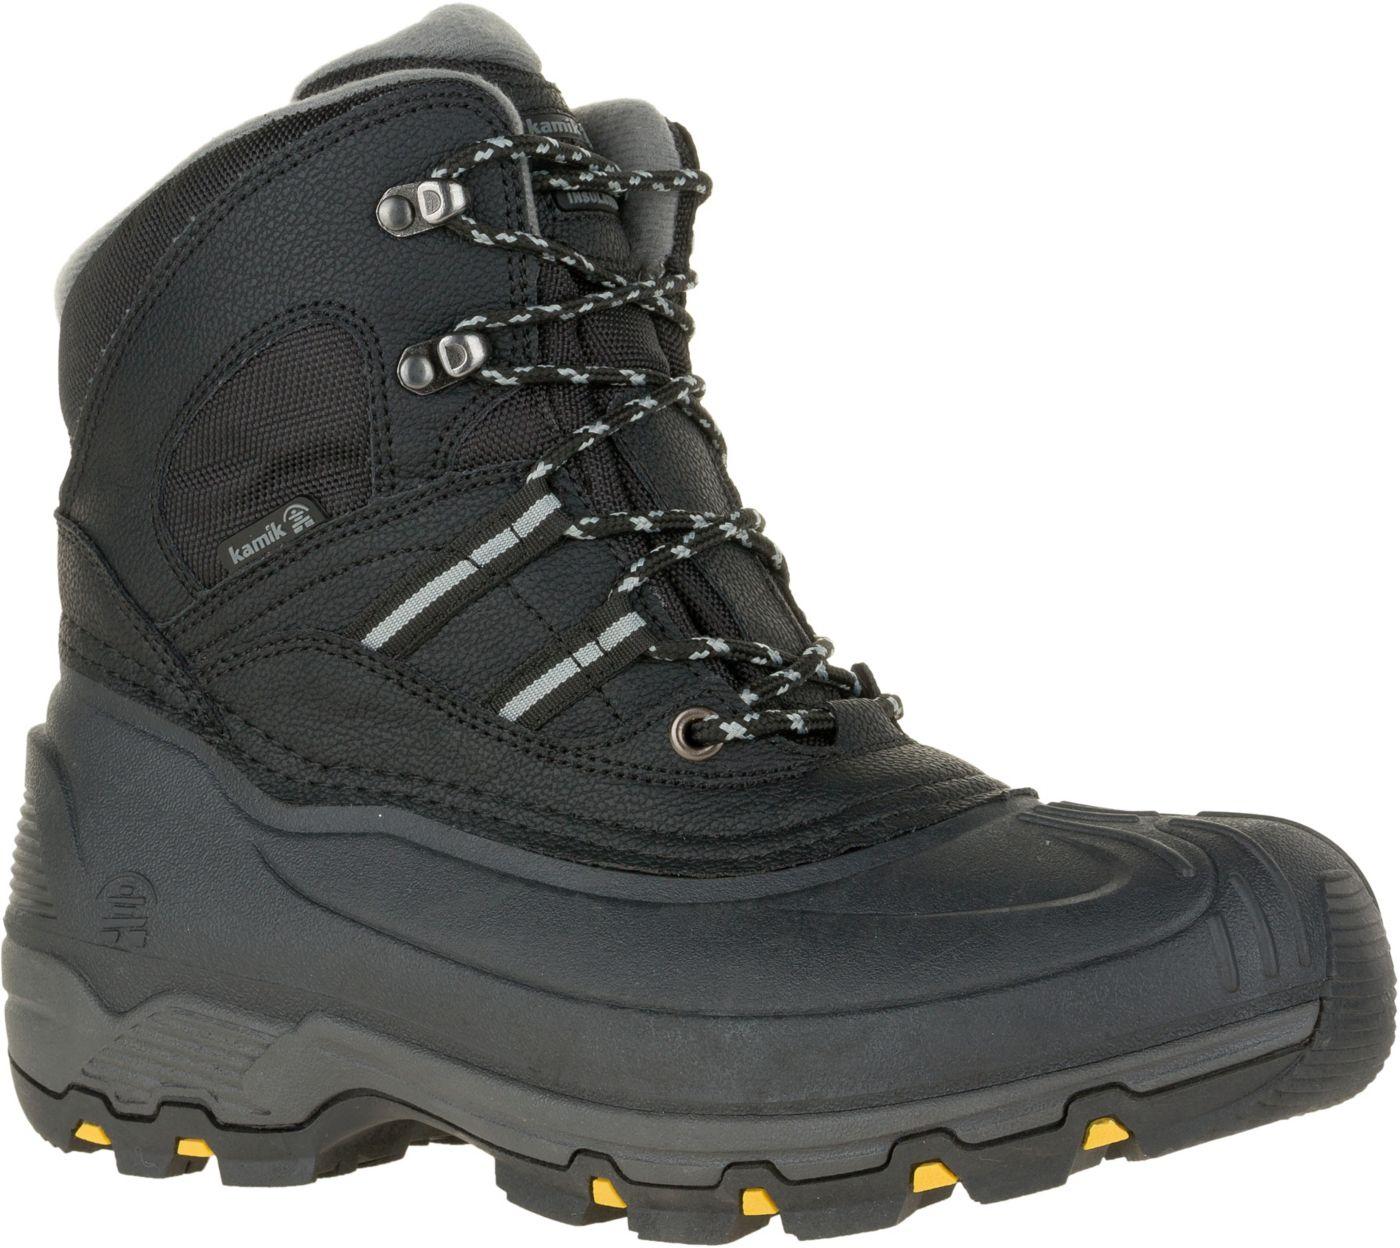 Kamik Men's Warrior2 200g Winter Boots